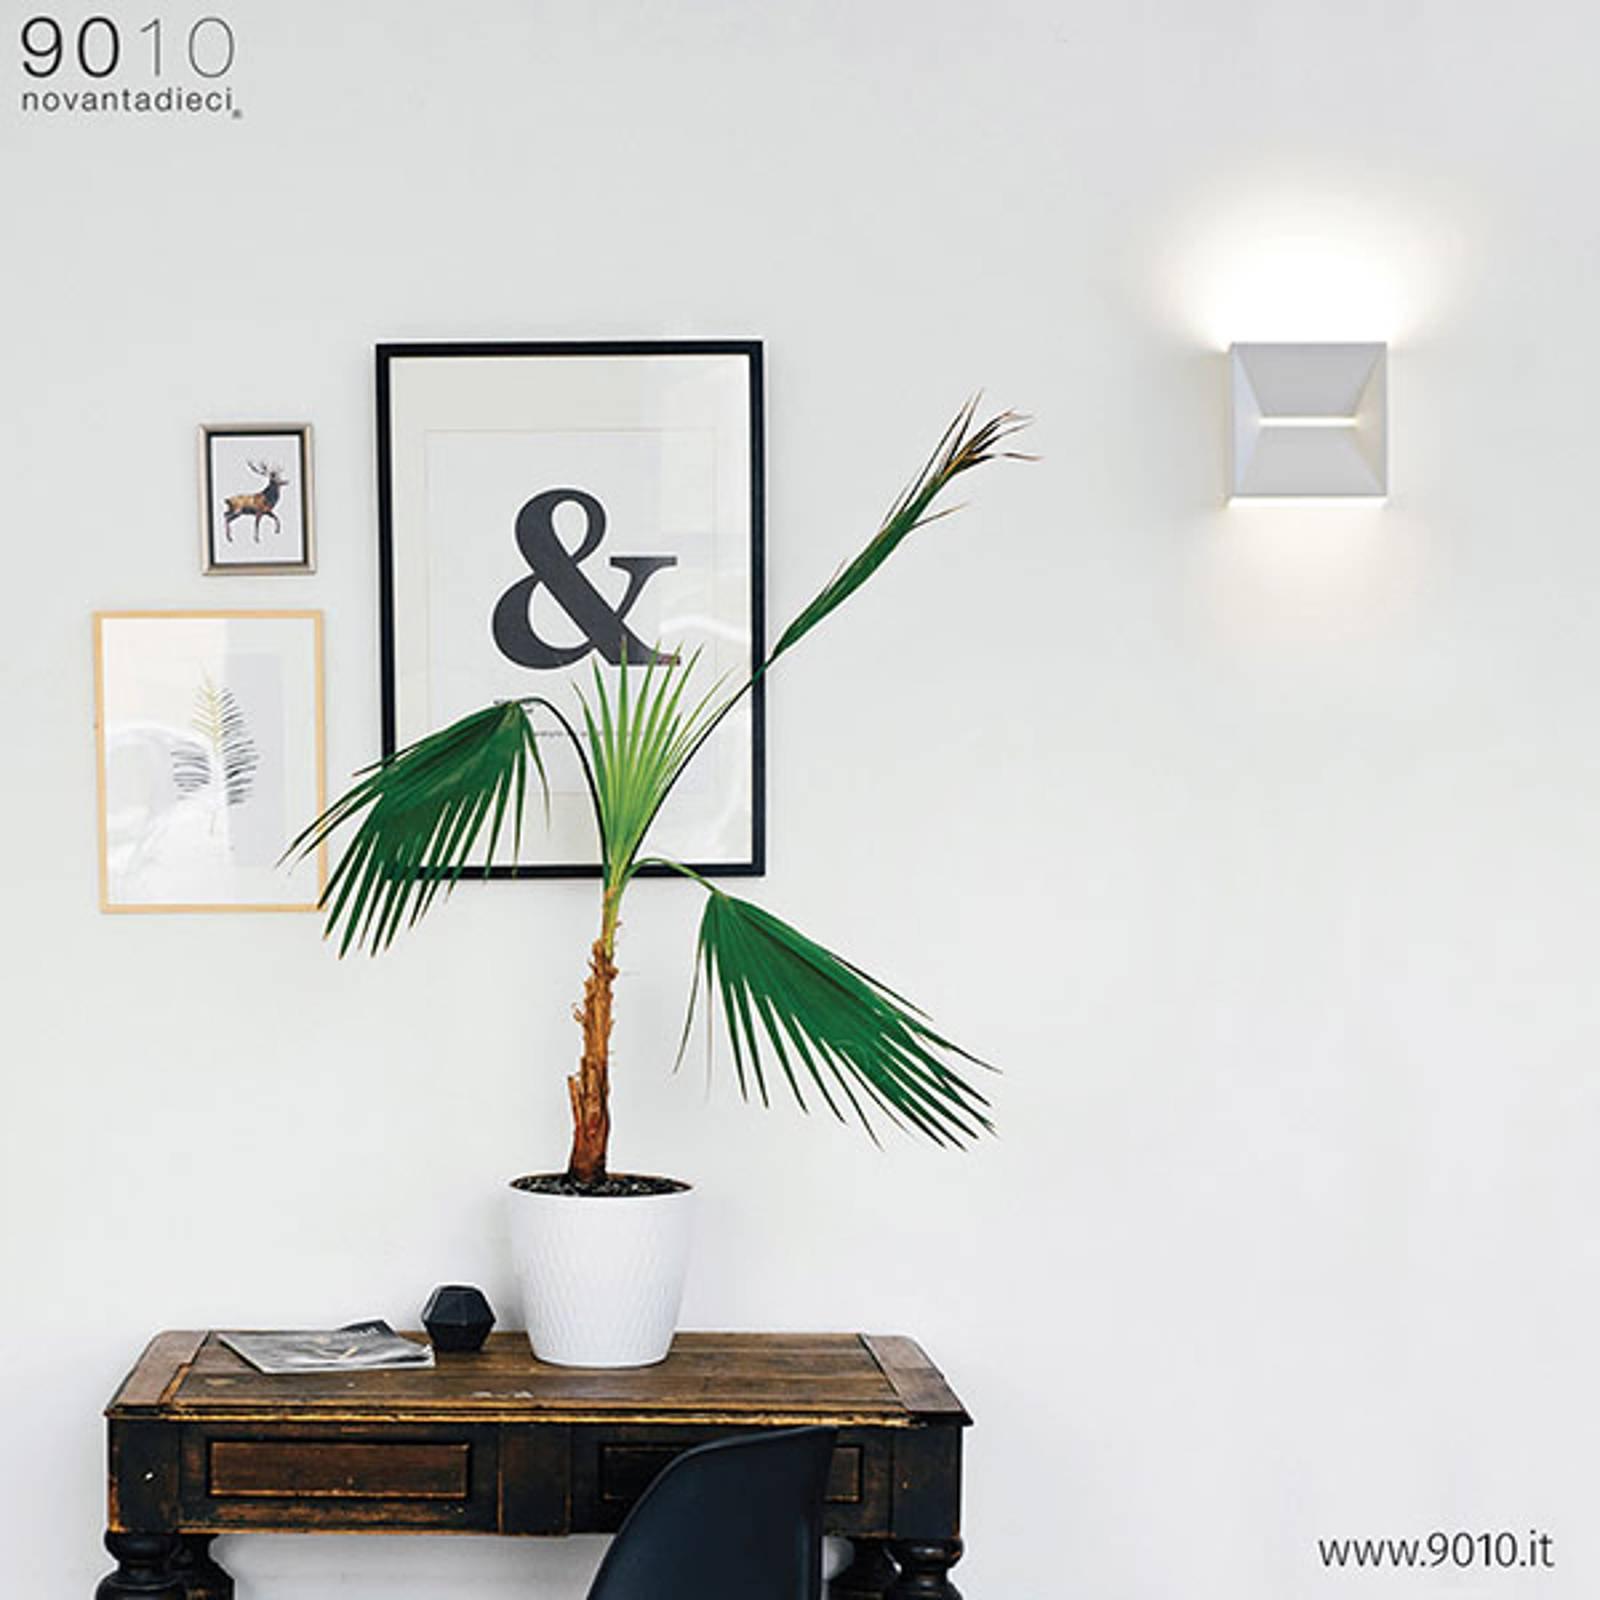 LED-designer-vegglampe 2511, 2 700 K, dimbar